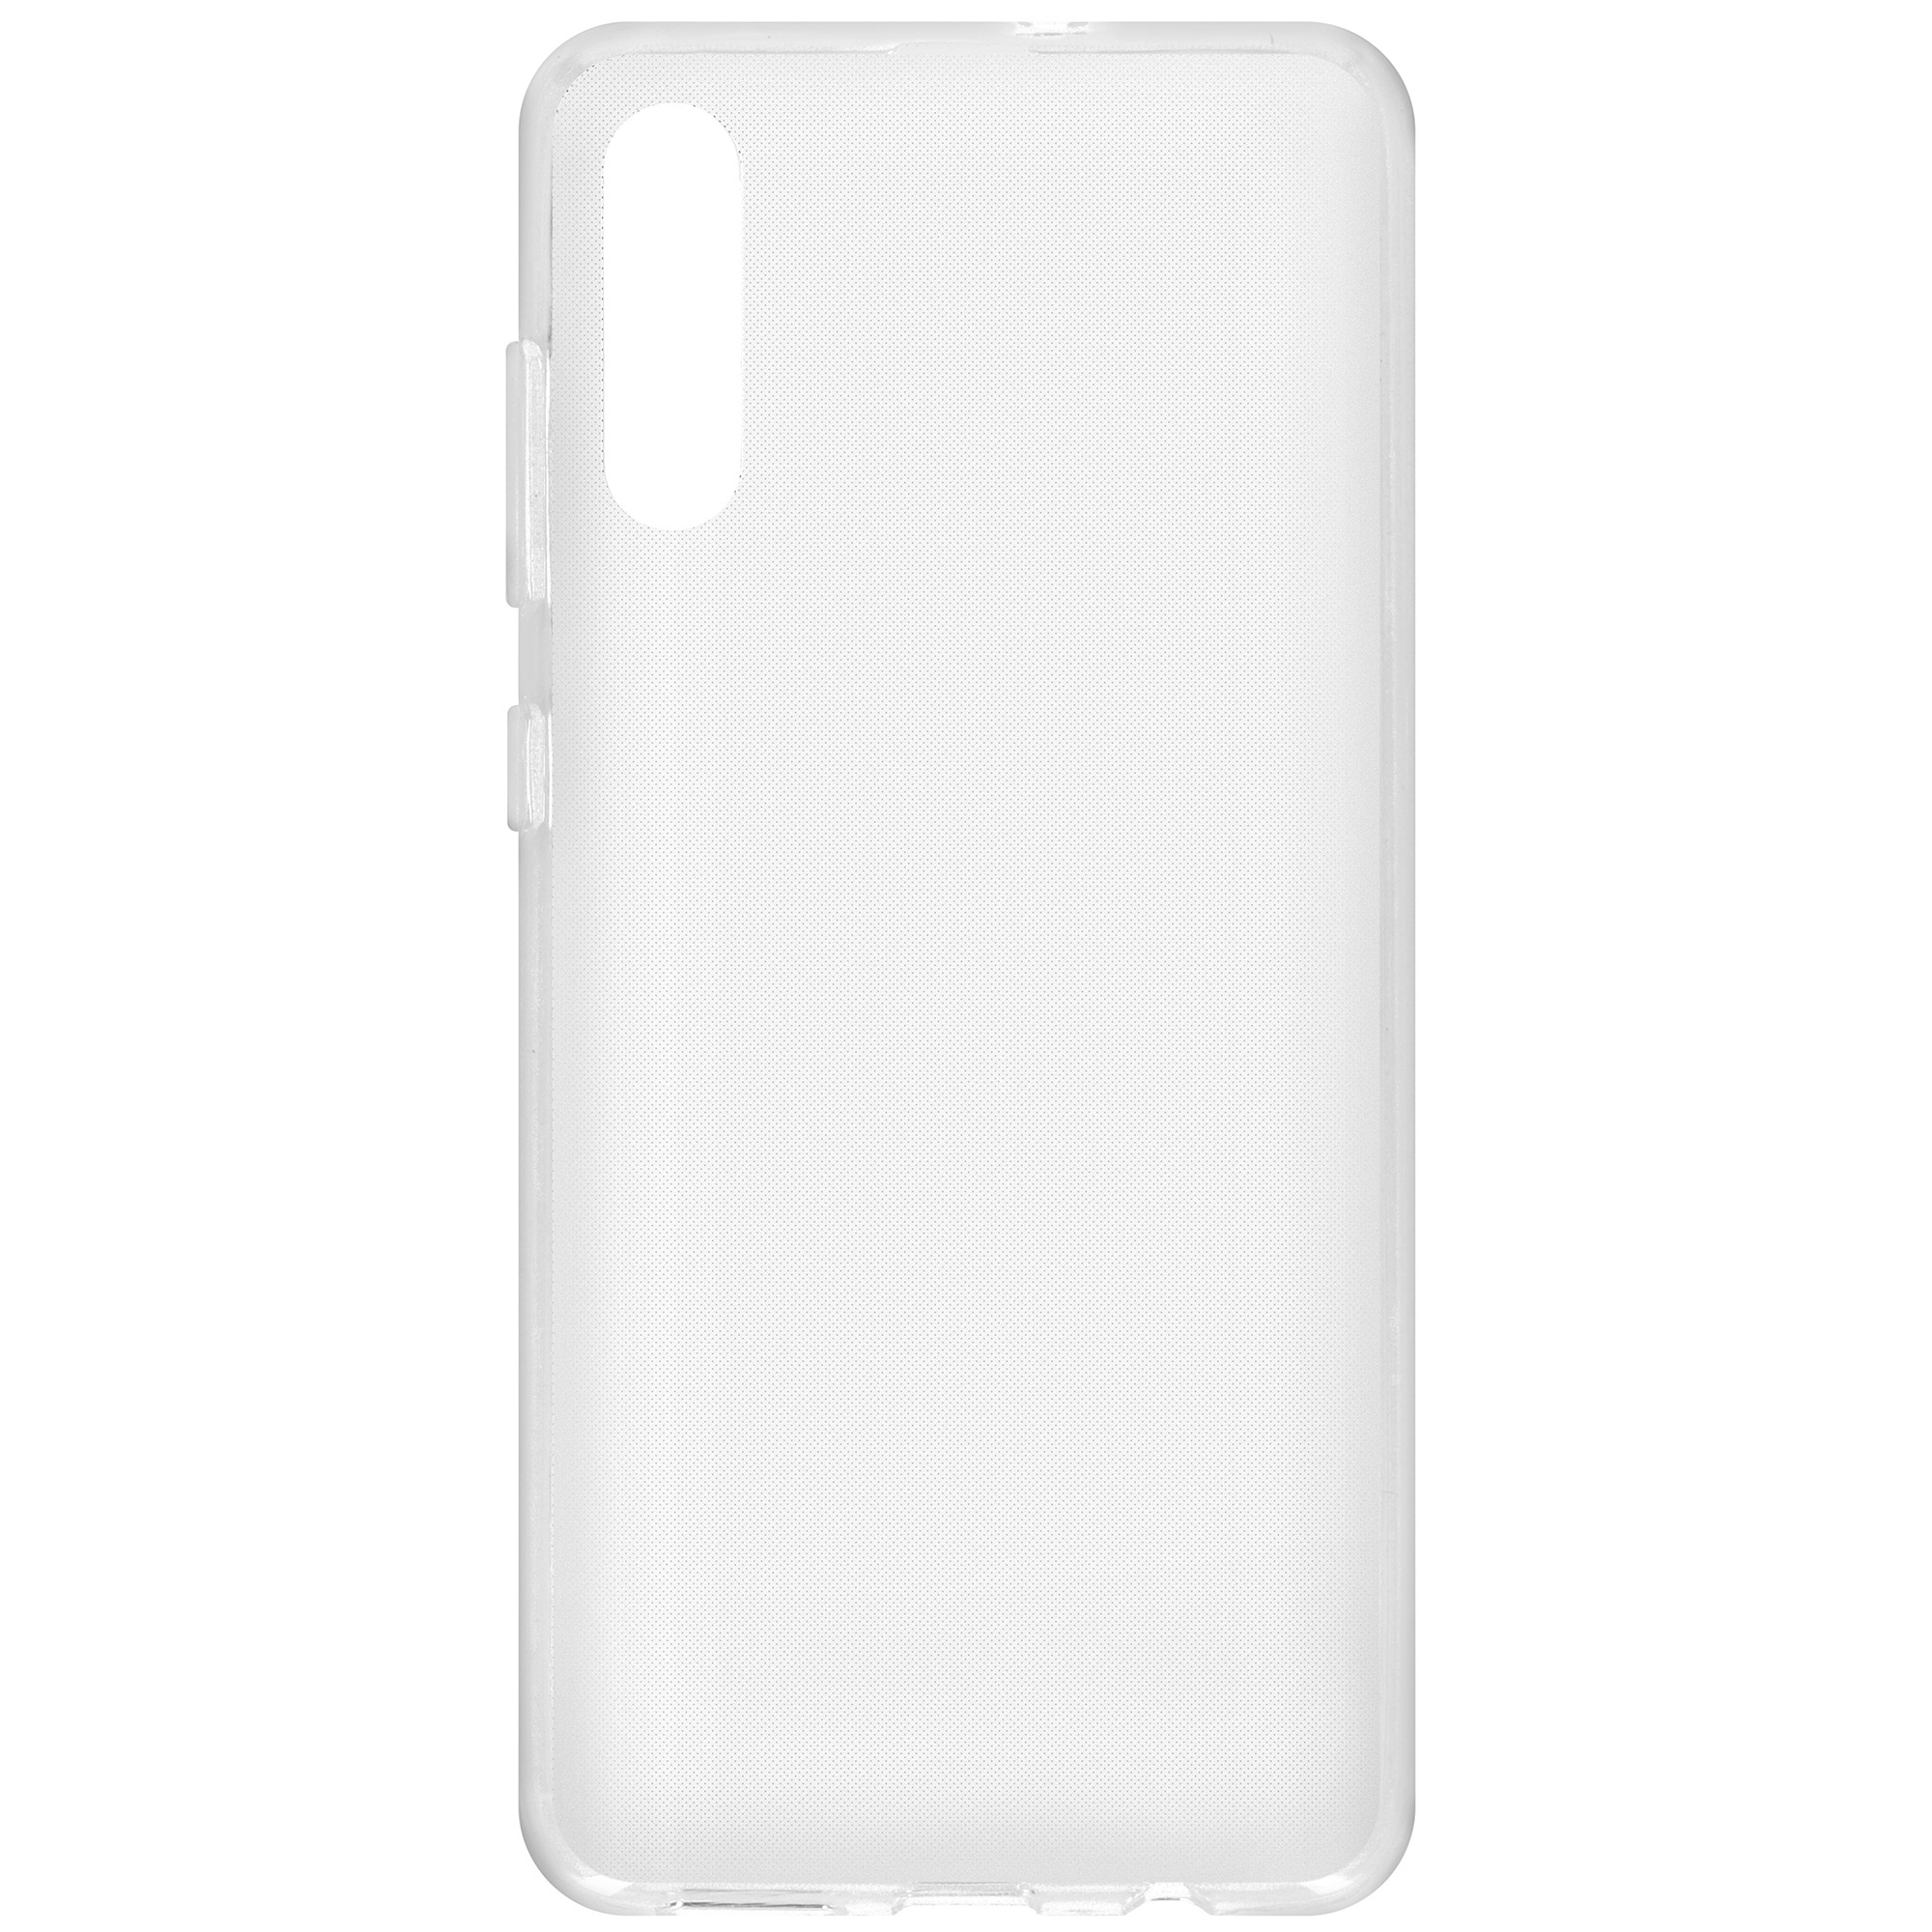 Softcase Backcover Samsung Galaxy A70 - Transparant